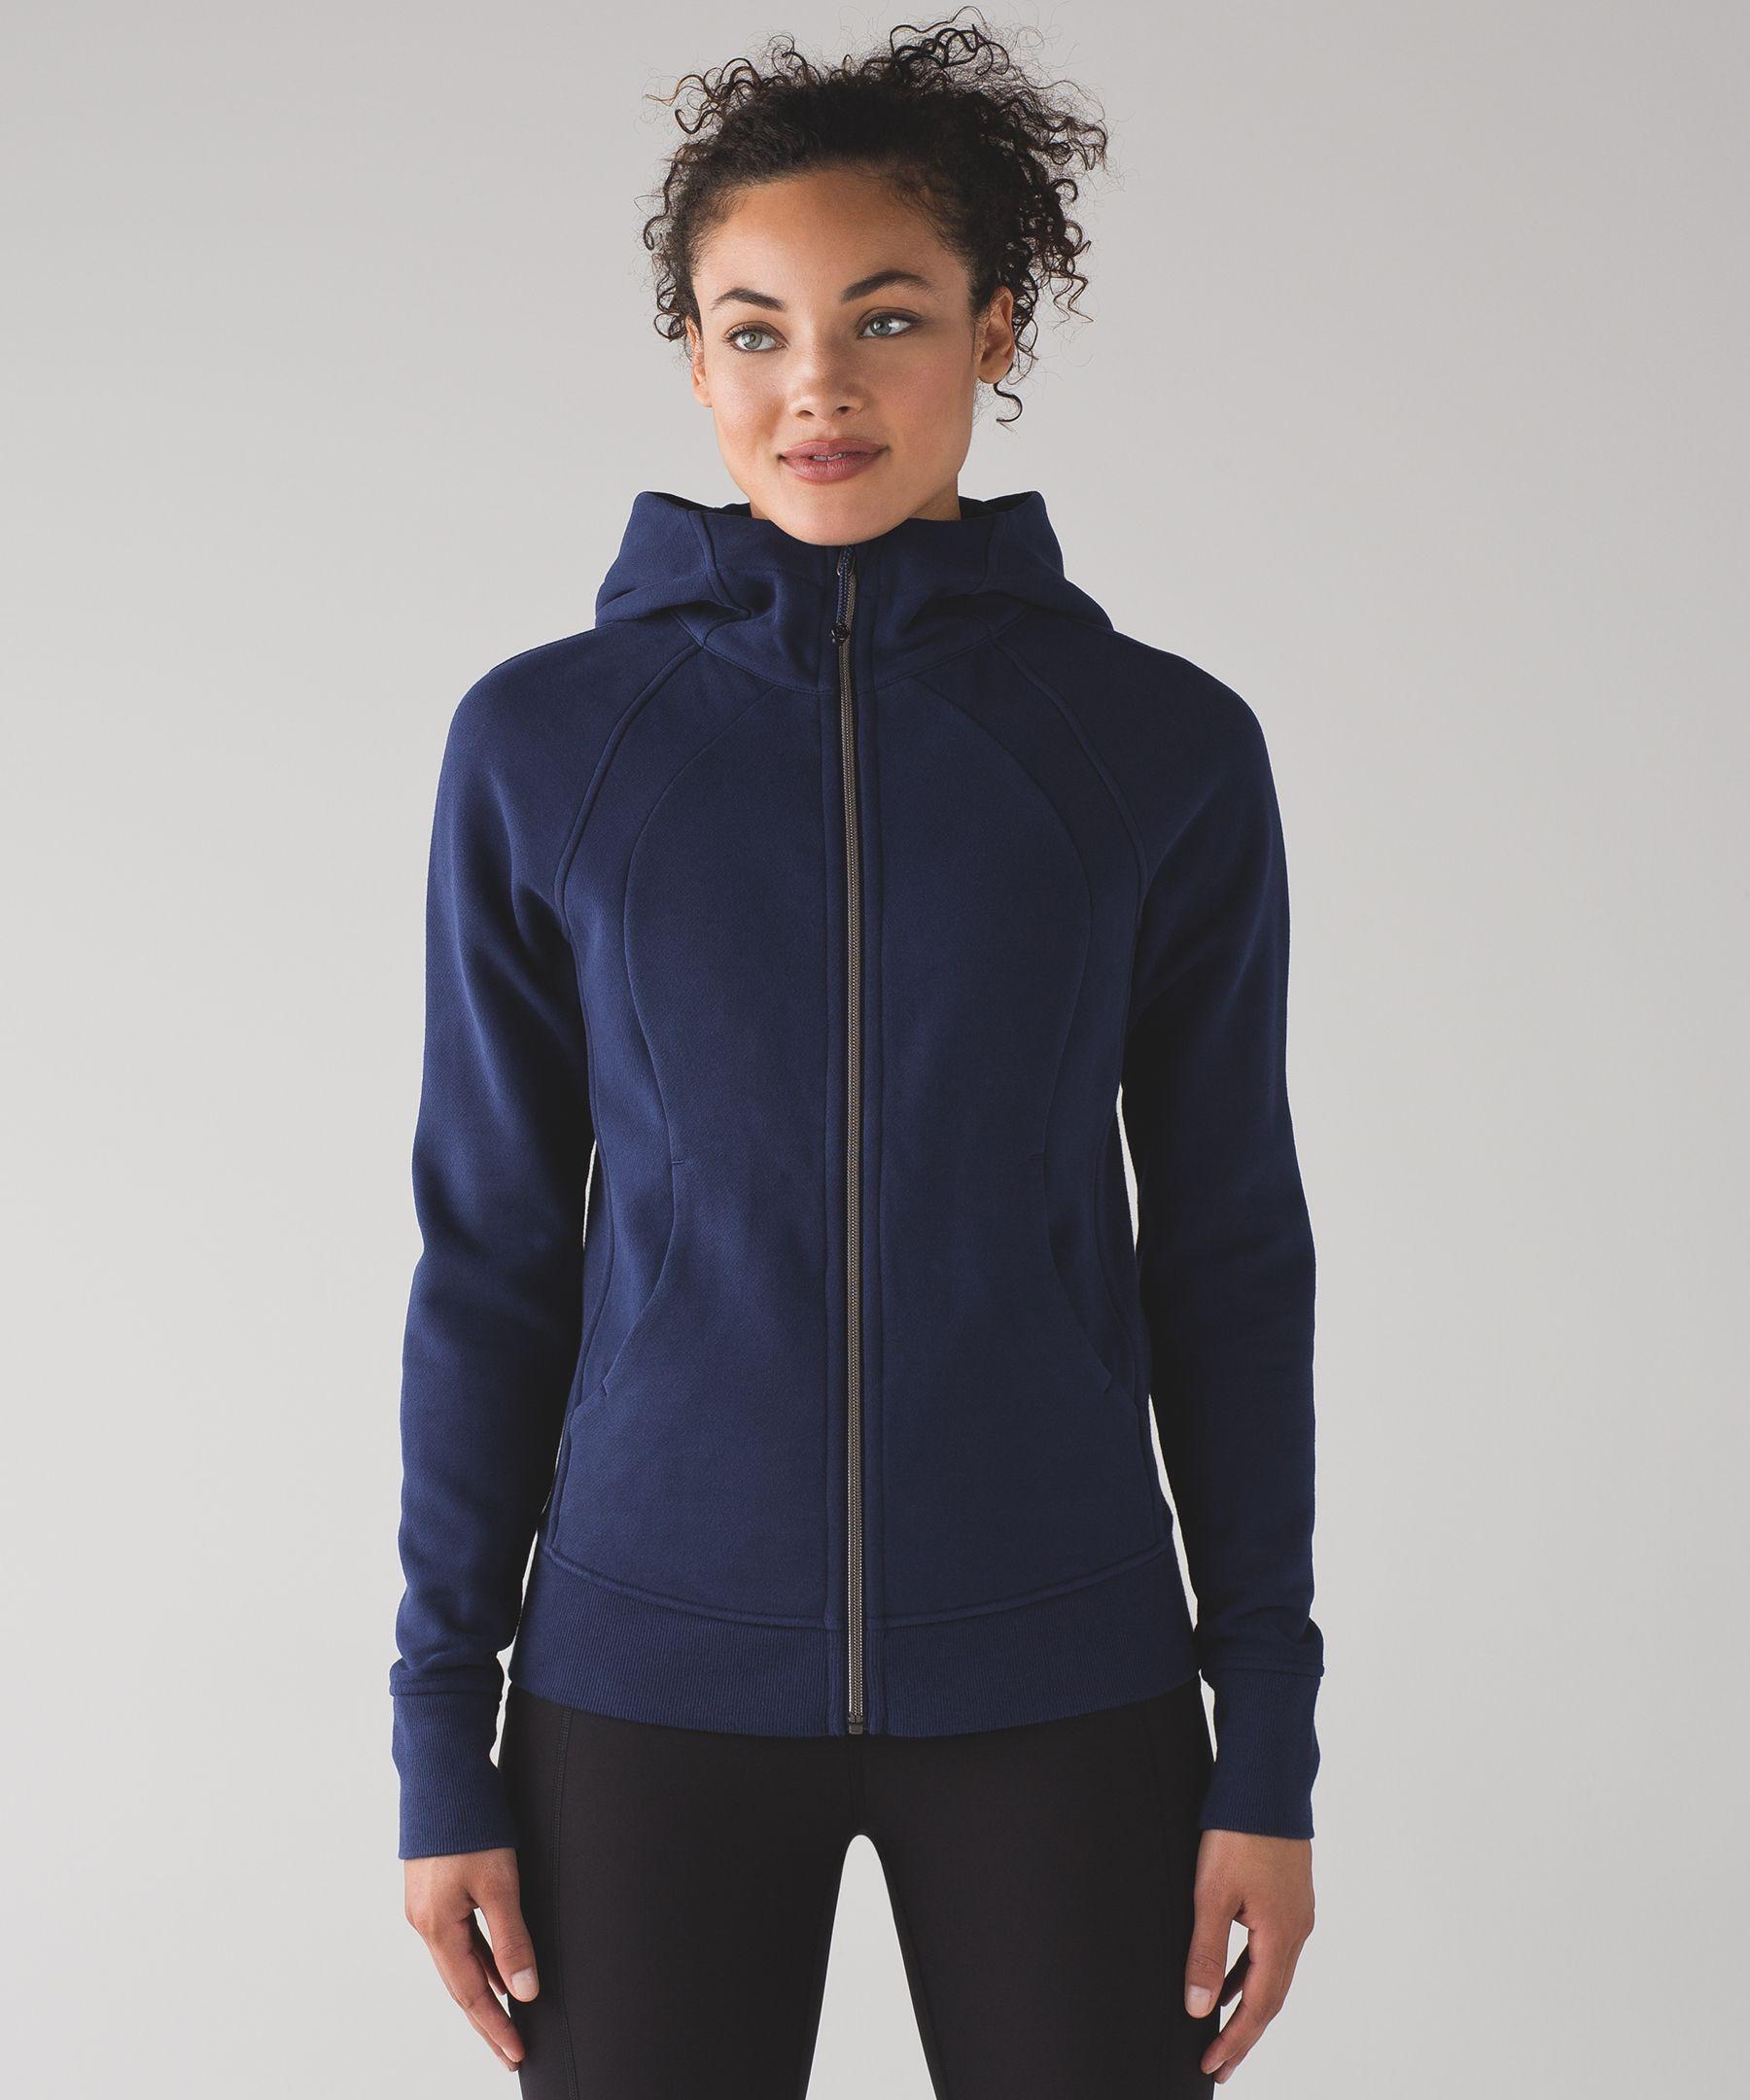 Scuba hoodies